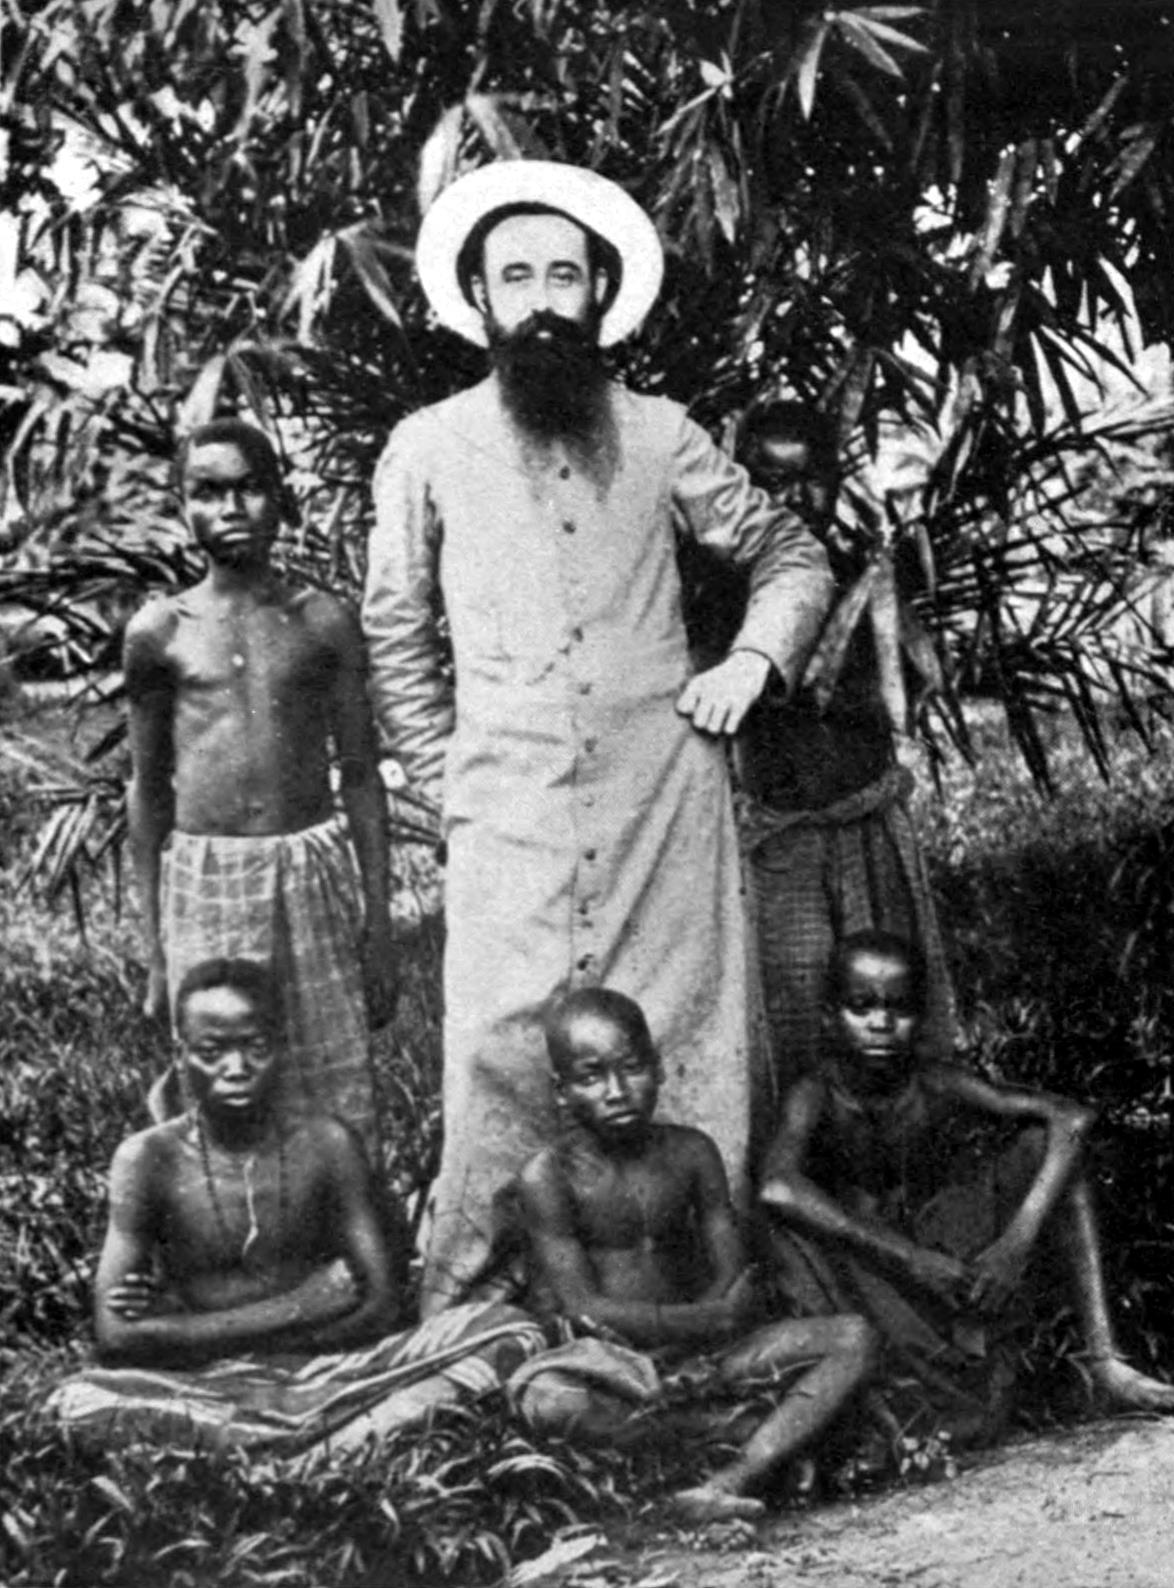 The Butcher of Congo: King Leopold II of Belgium.